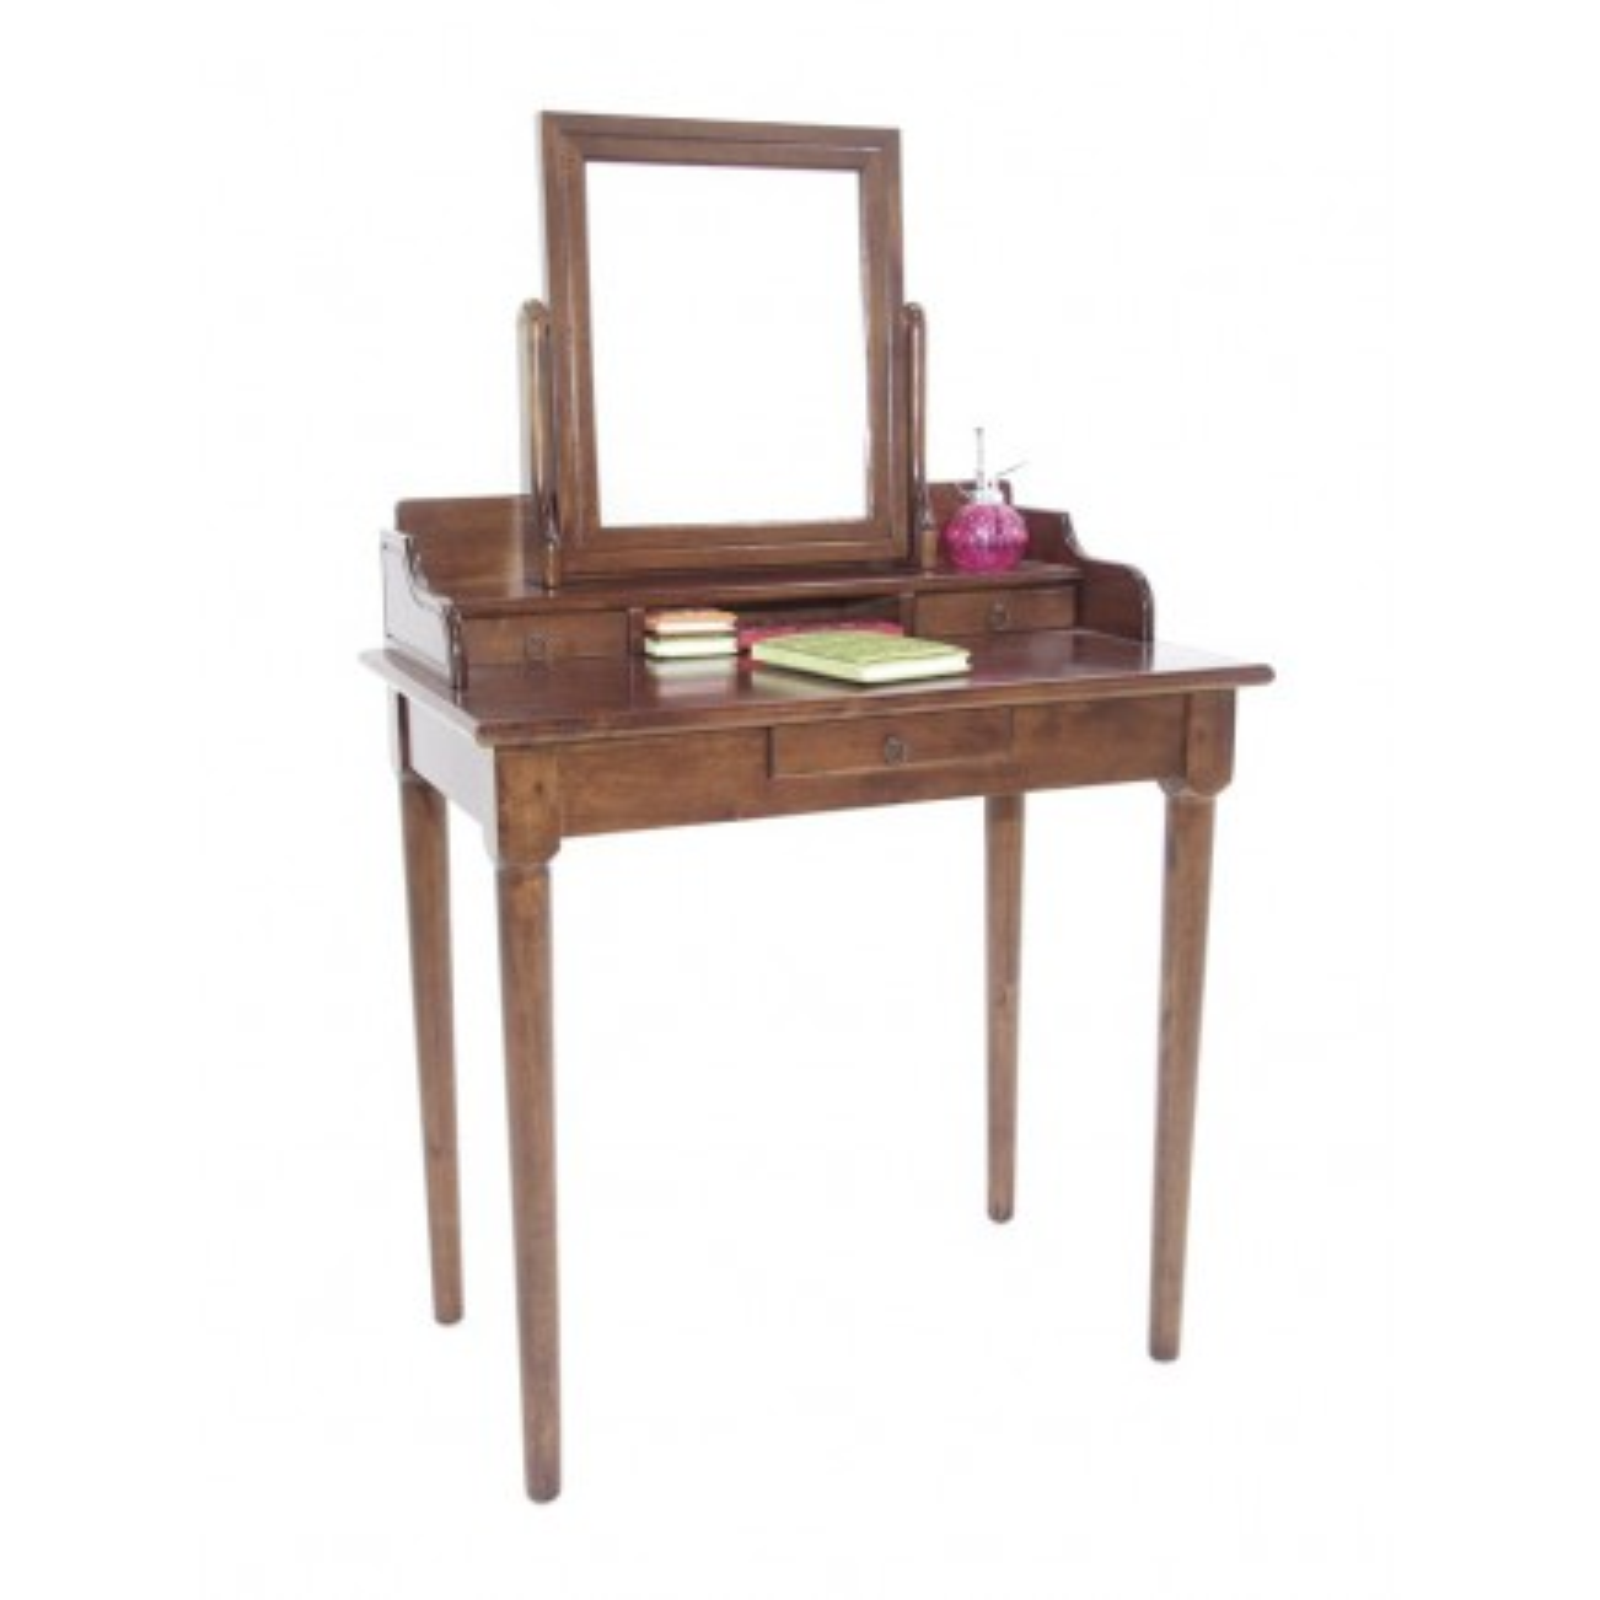 Coiffeuse Tradition Hévéa - meuble style classique